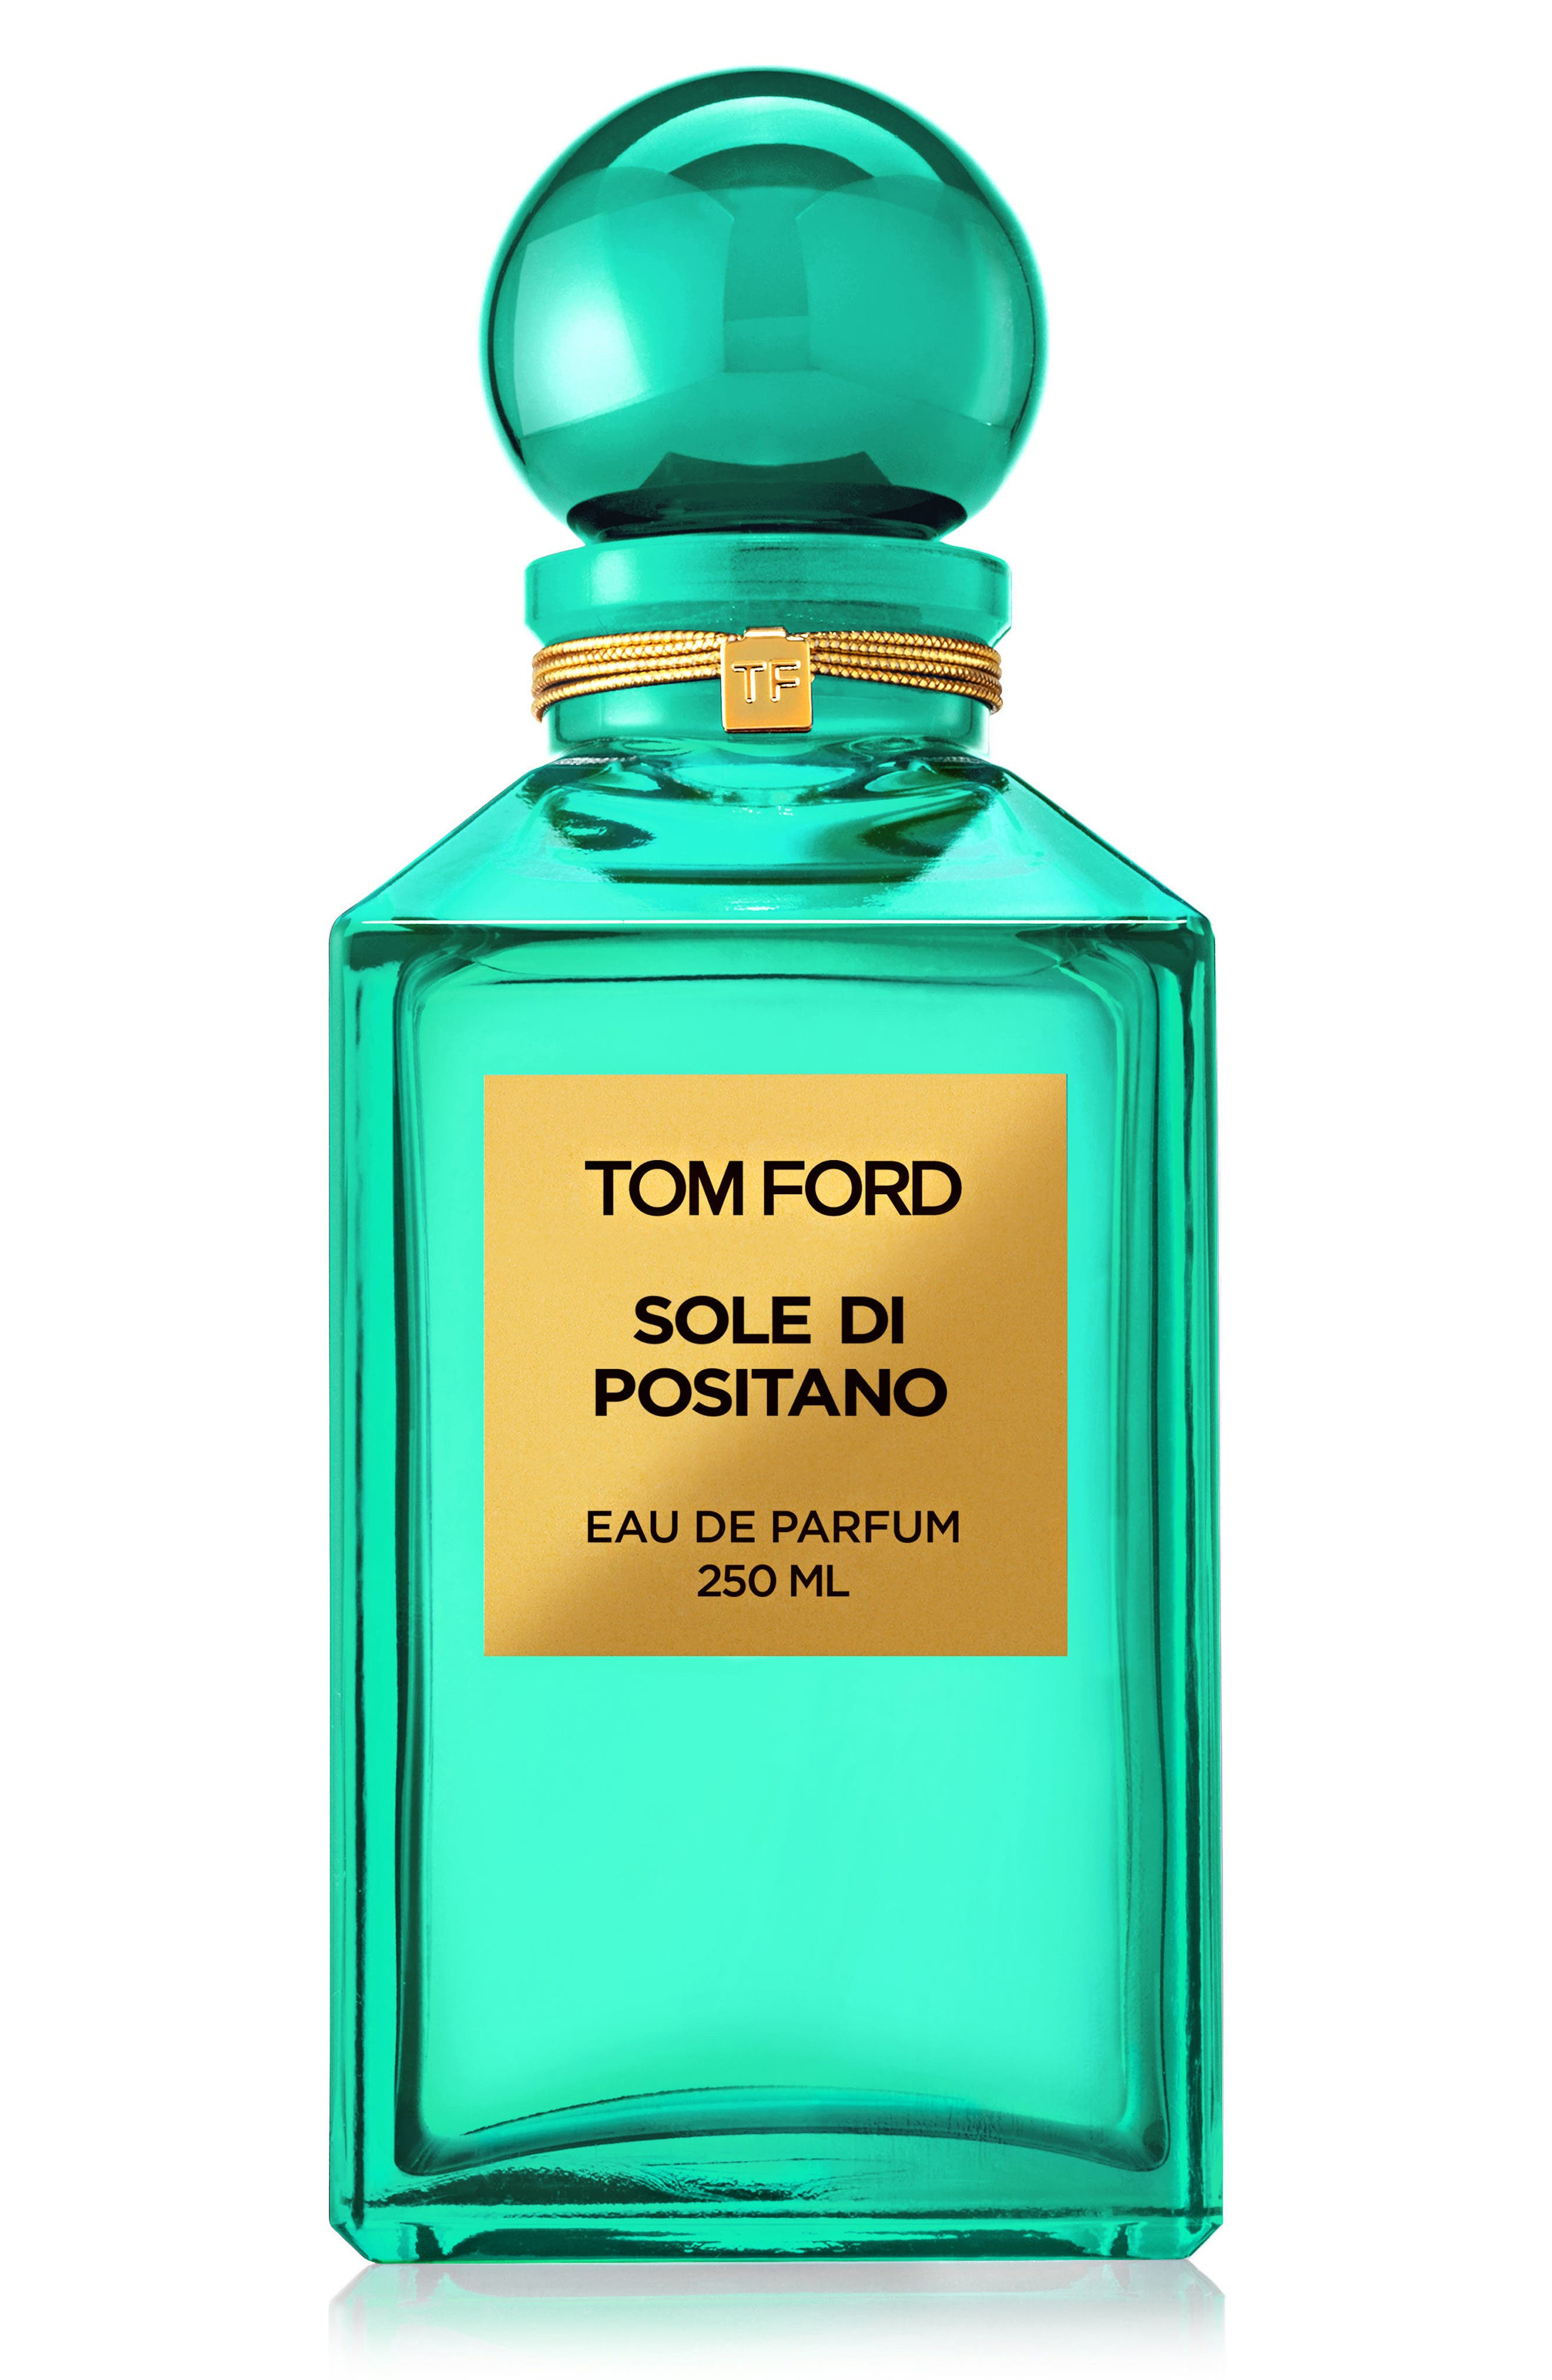 Alternate Image 1 Selected - Tom Ford Private Blend Sole di Positano Eau de Parfum Decanter